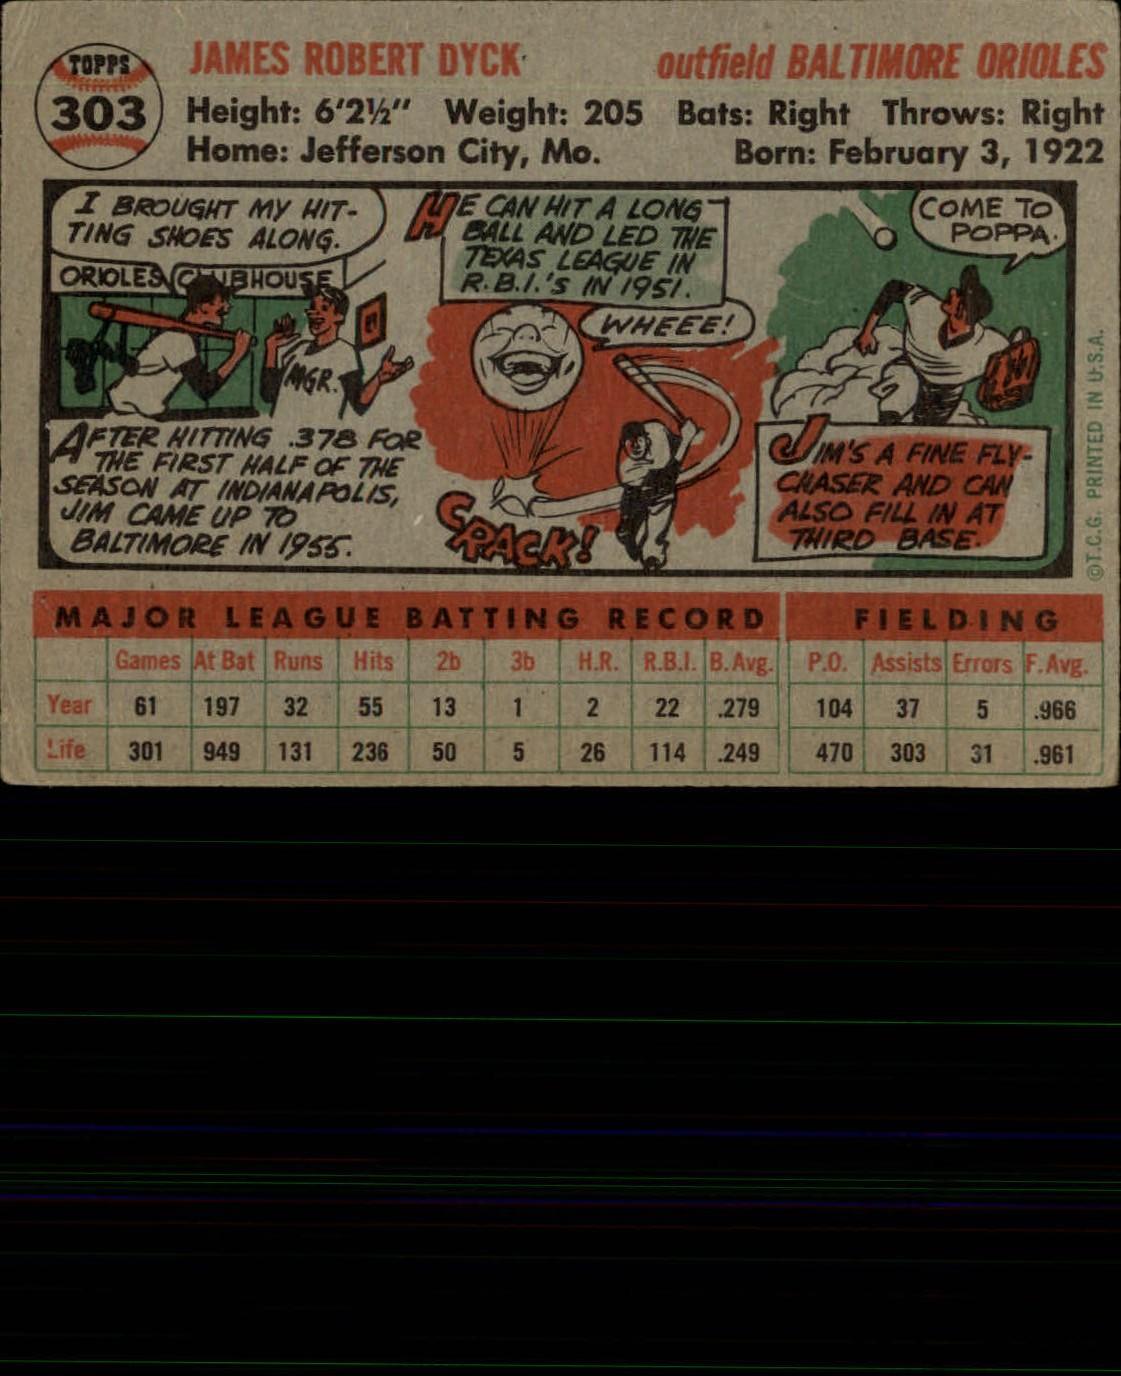 1956-TOPPS-BASEBALL-ASSORTED-SINGLES-U-PICK-242-319 thumbnail 194